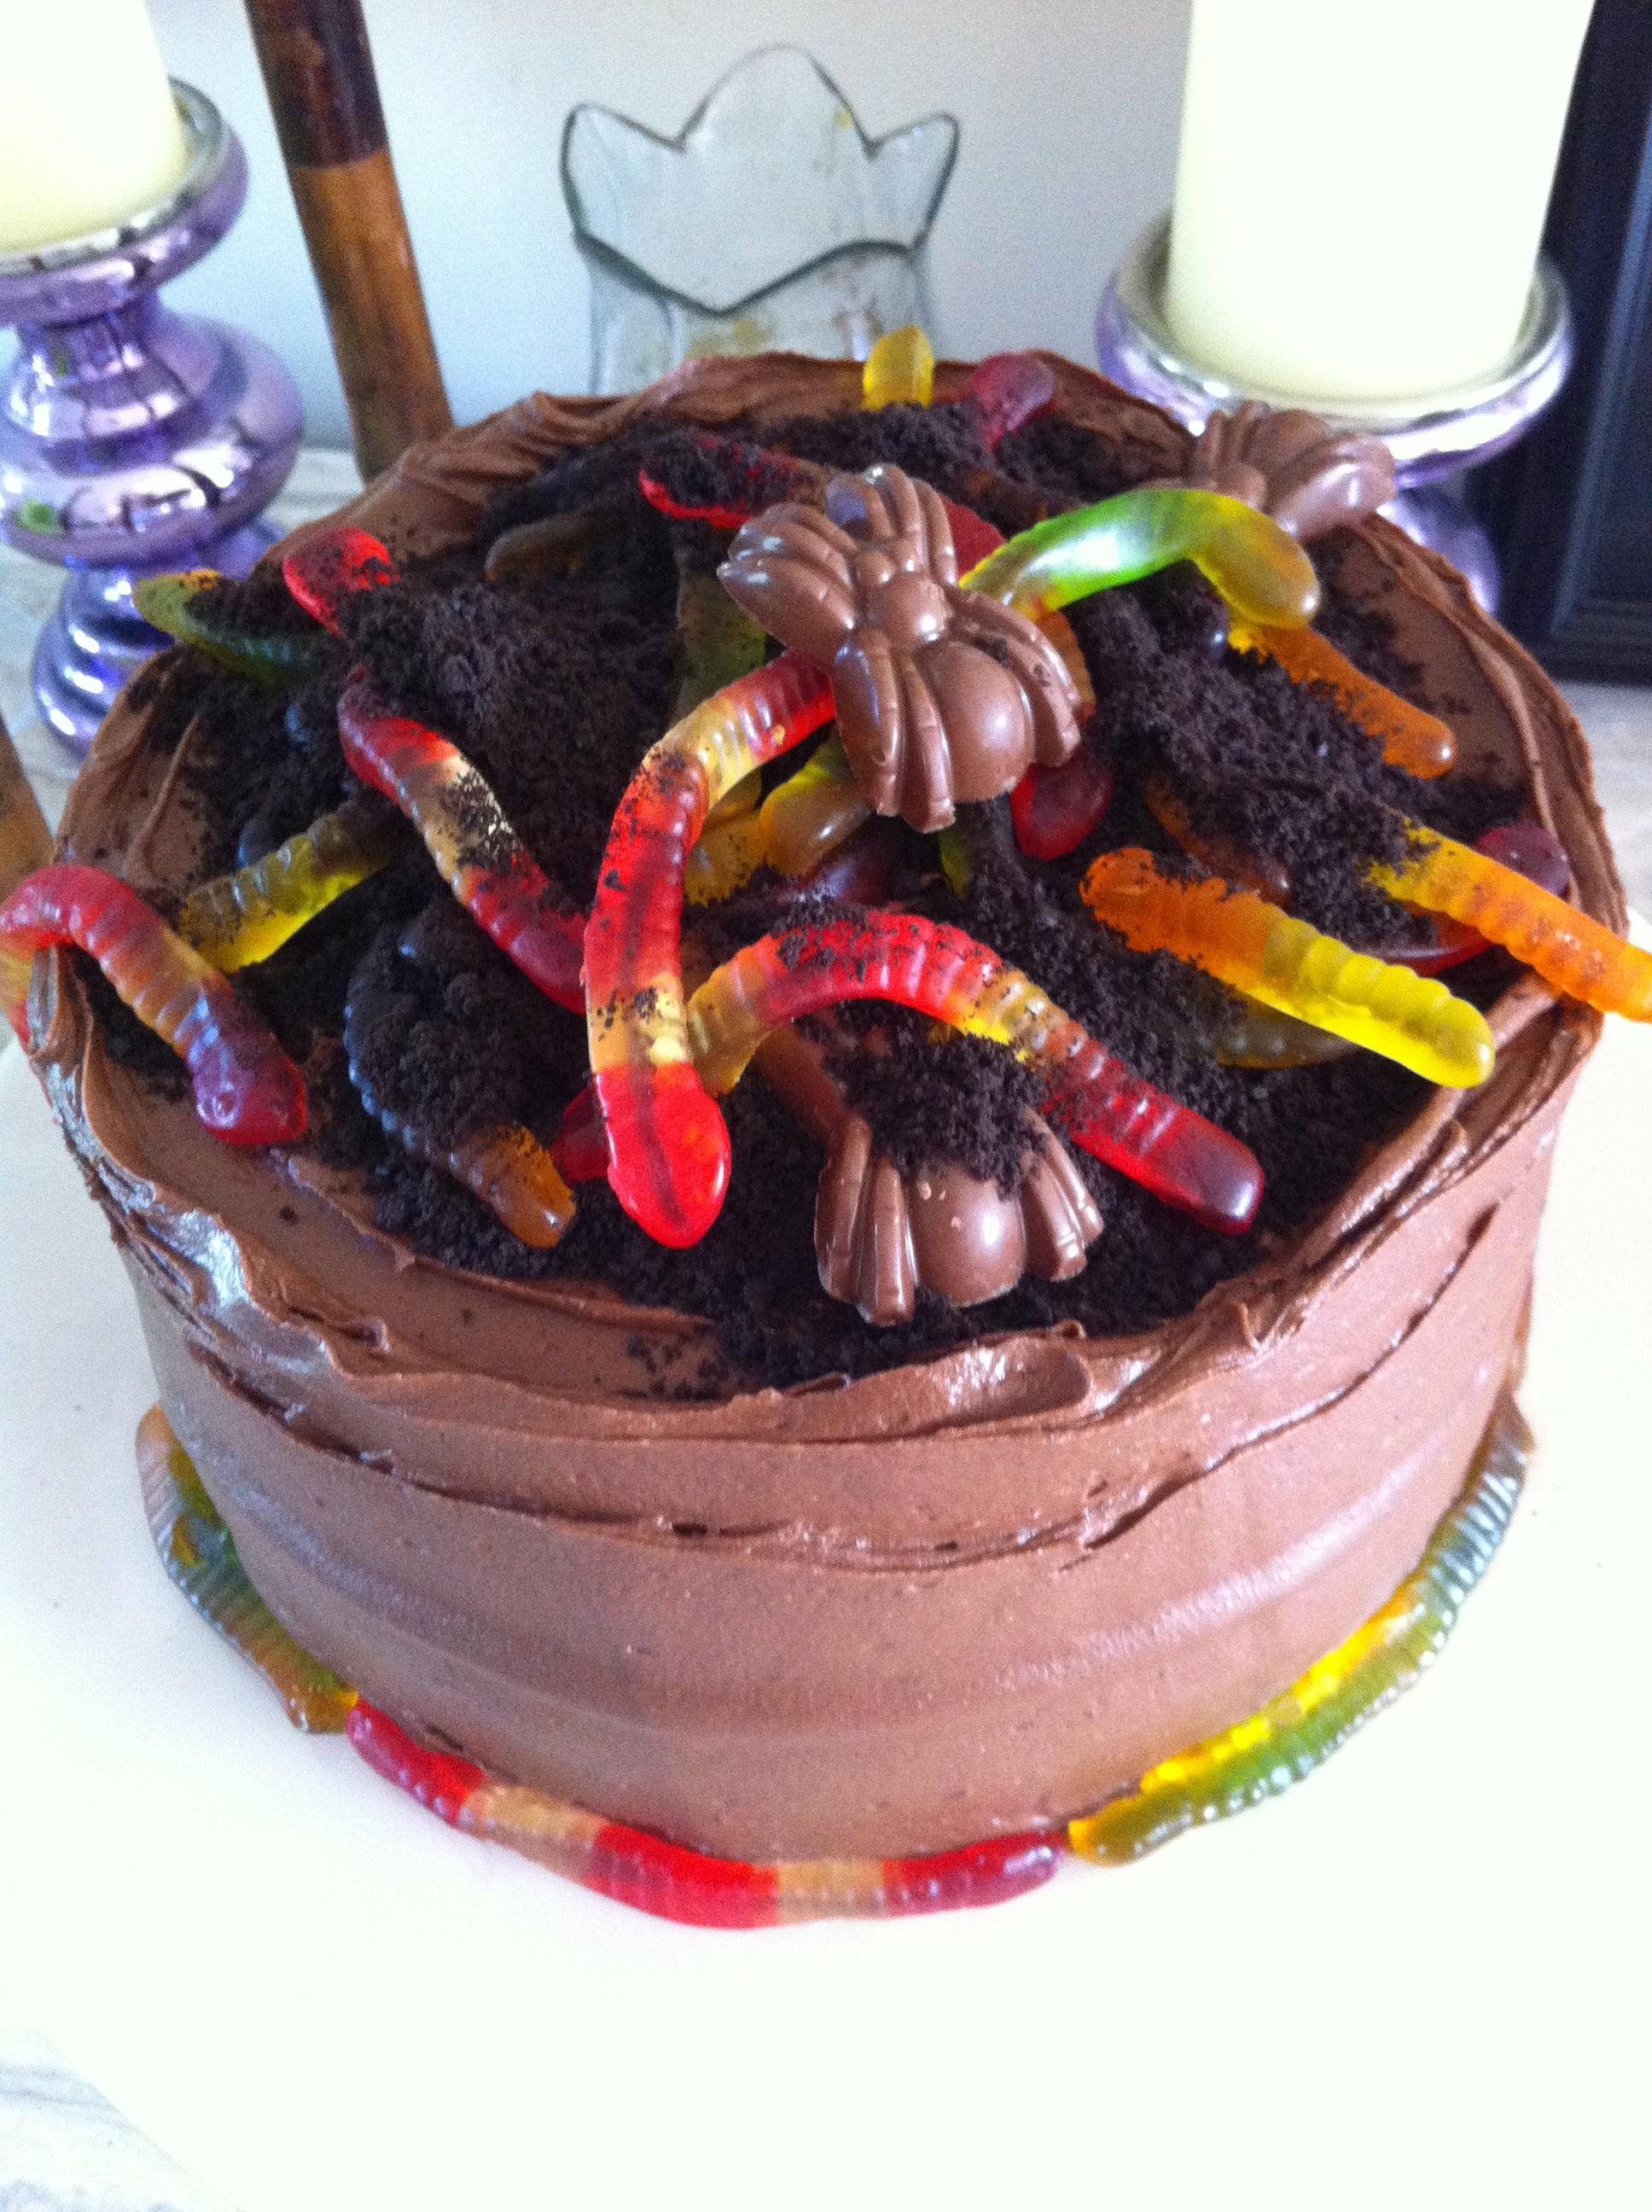 Sensational Worm Cakes Anniversary40Th Birthday Cakes Bake My Day Ronnas Blog Funny Birthday Cards Online Chimdamsfinfo